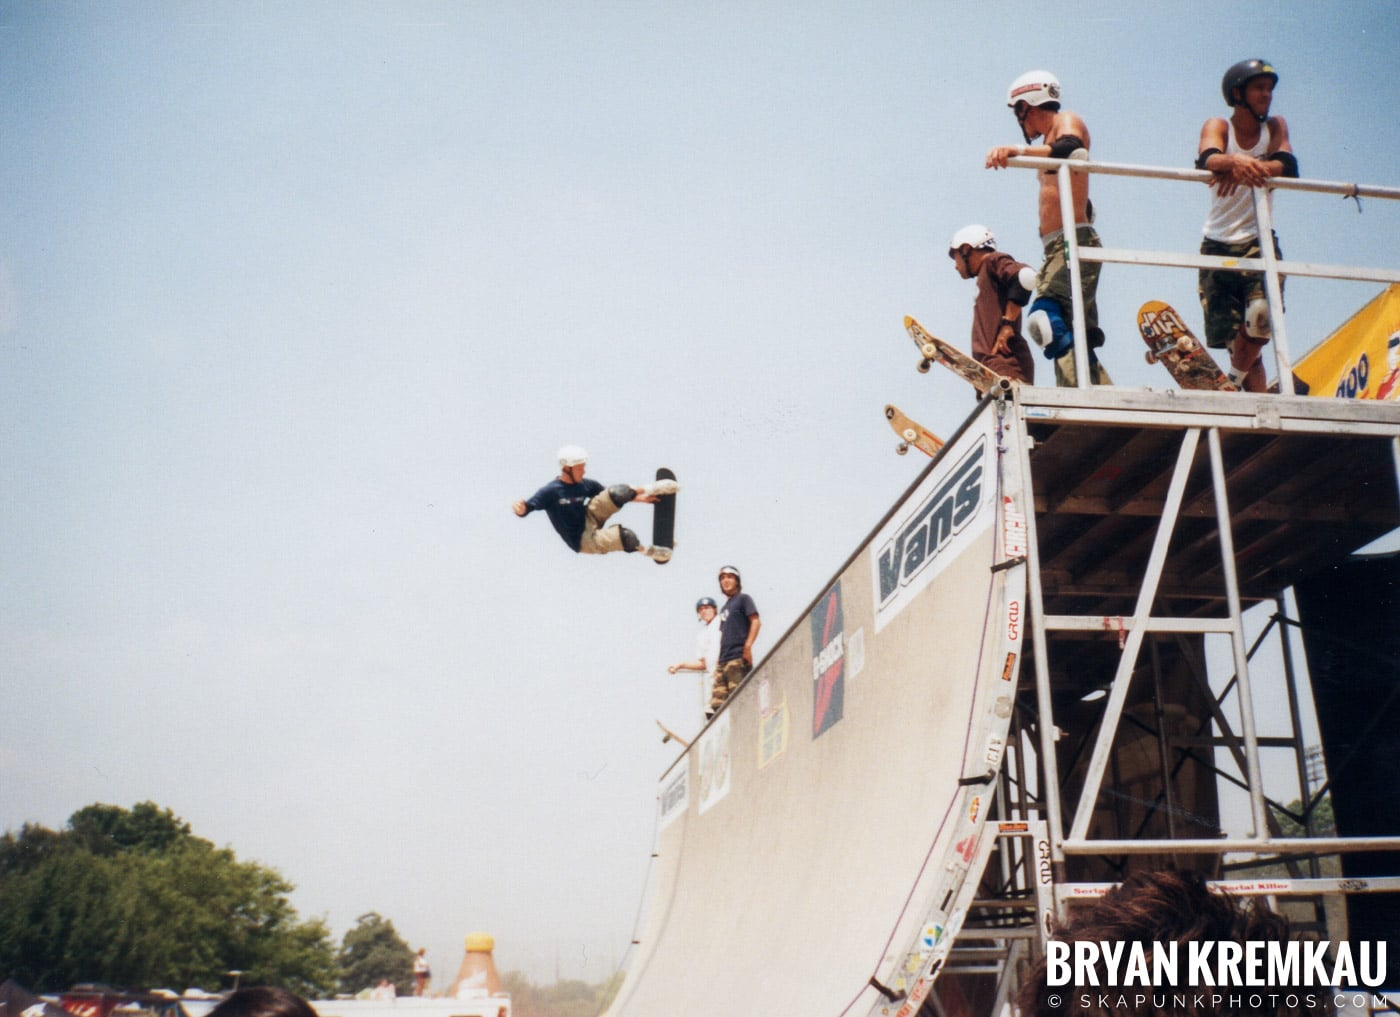 Skaters @ Vans Warped Tour, Randall's Island, NYC - 7.16.99 (11)